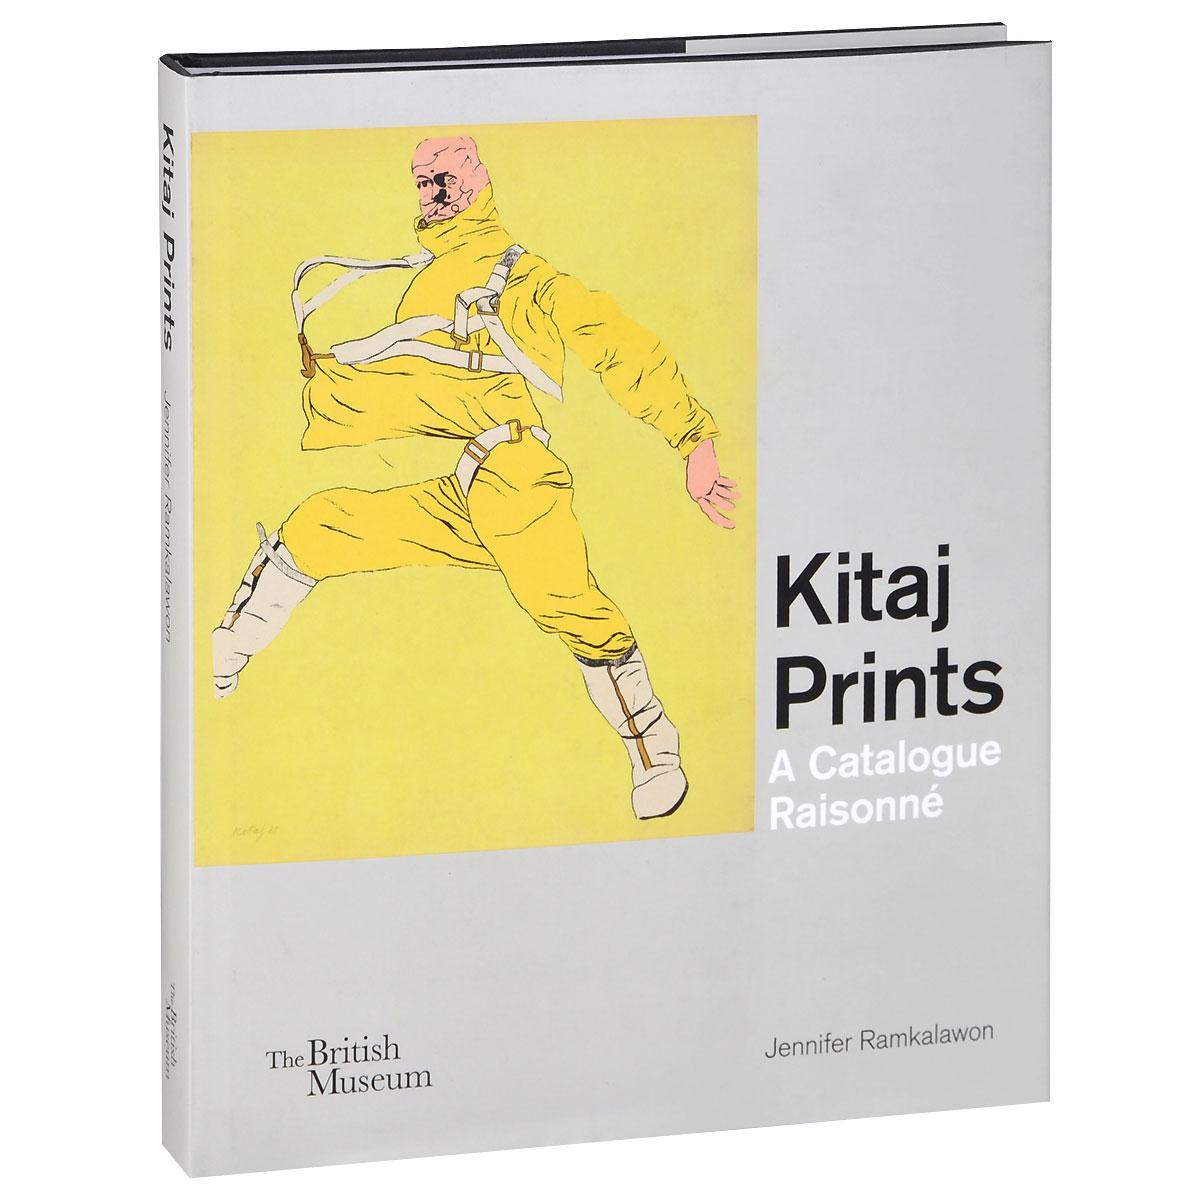 Kitaj Prints: A Catalogue Raisonne pardo patrick dean robert john baldessari catalogue raisonne volume 2 1975 1986